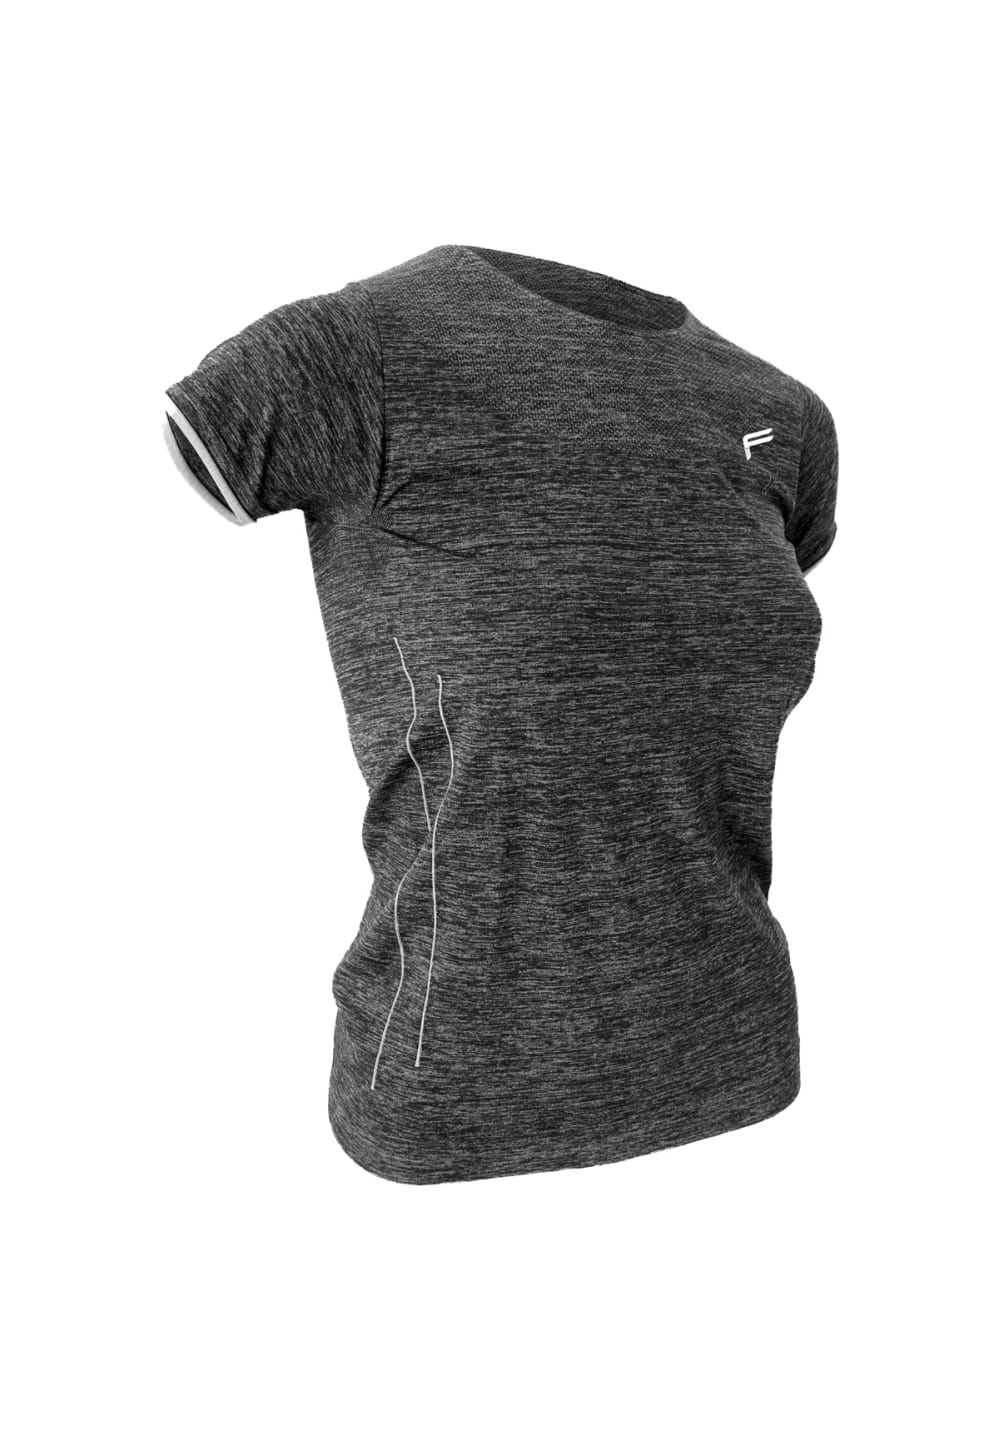 F-Lite Megalight 140 T-Shirt - Funktionsunterwäsche für Damen - Grau